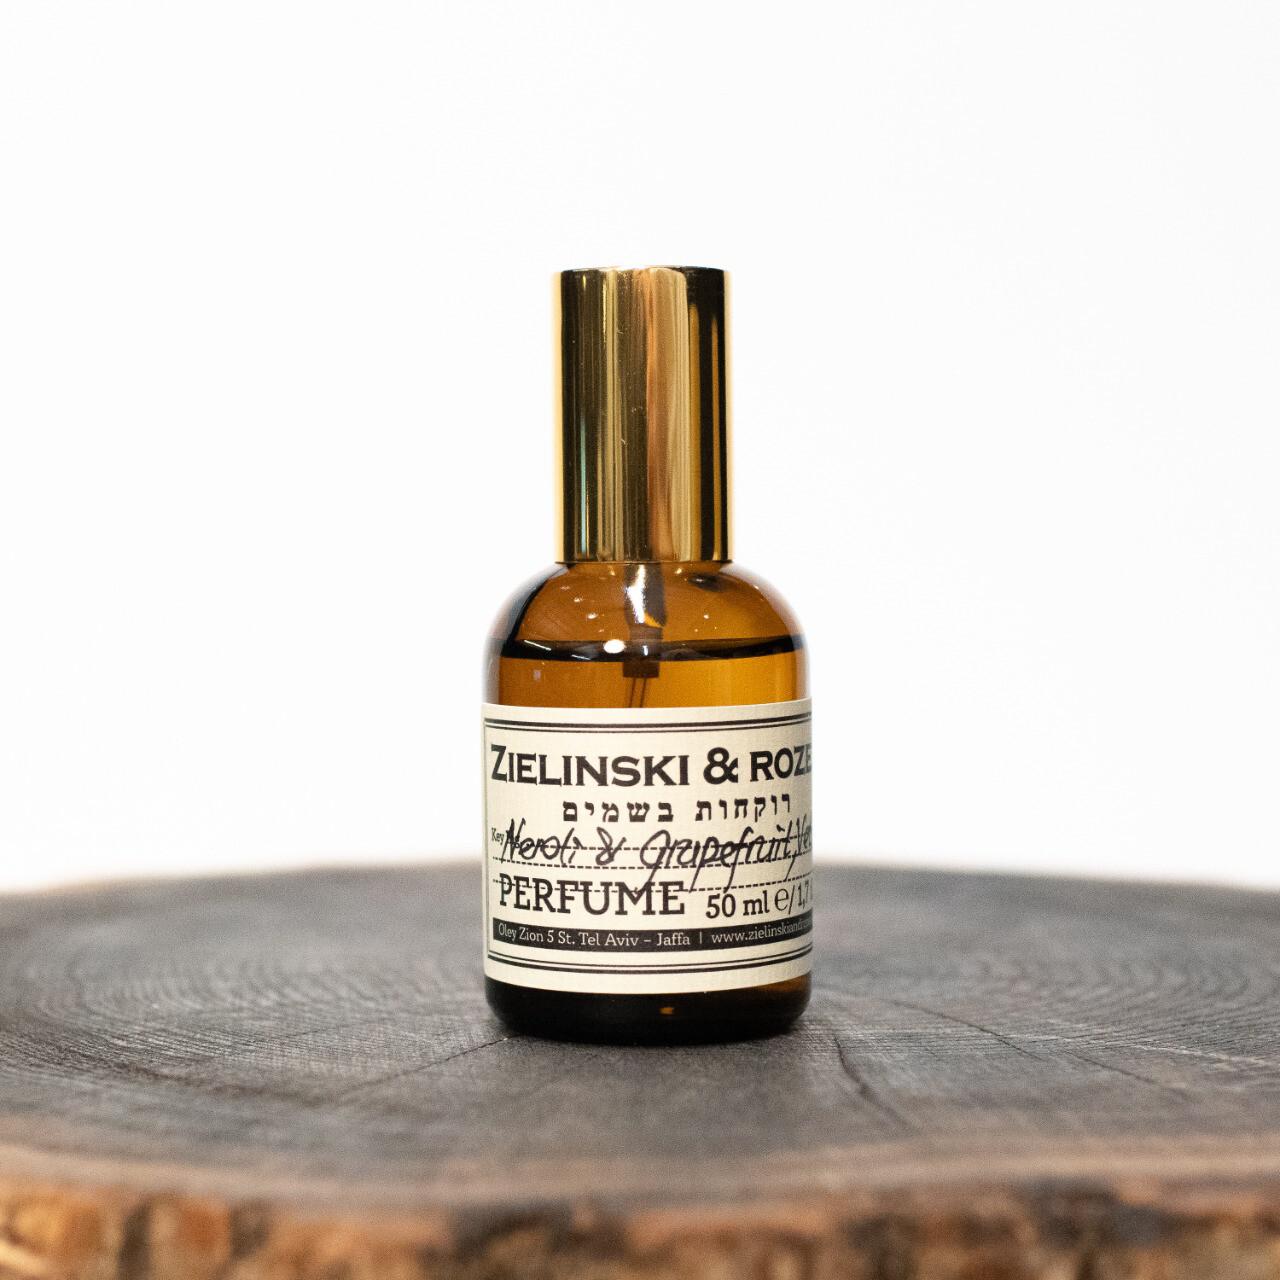 Perfume Neroli & Grapefruit, Vetiver (50 ml)